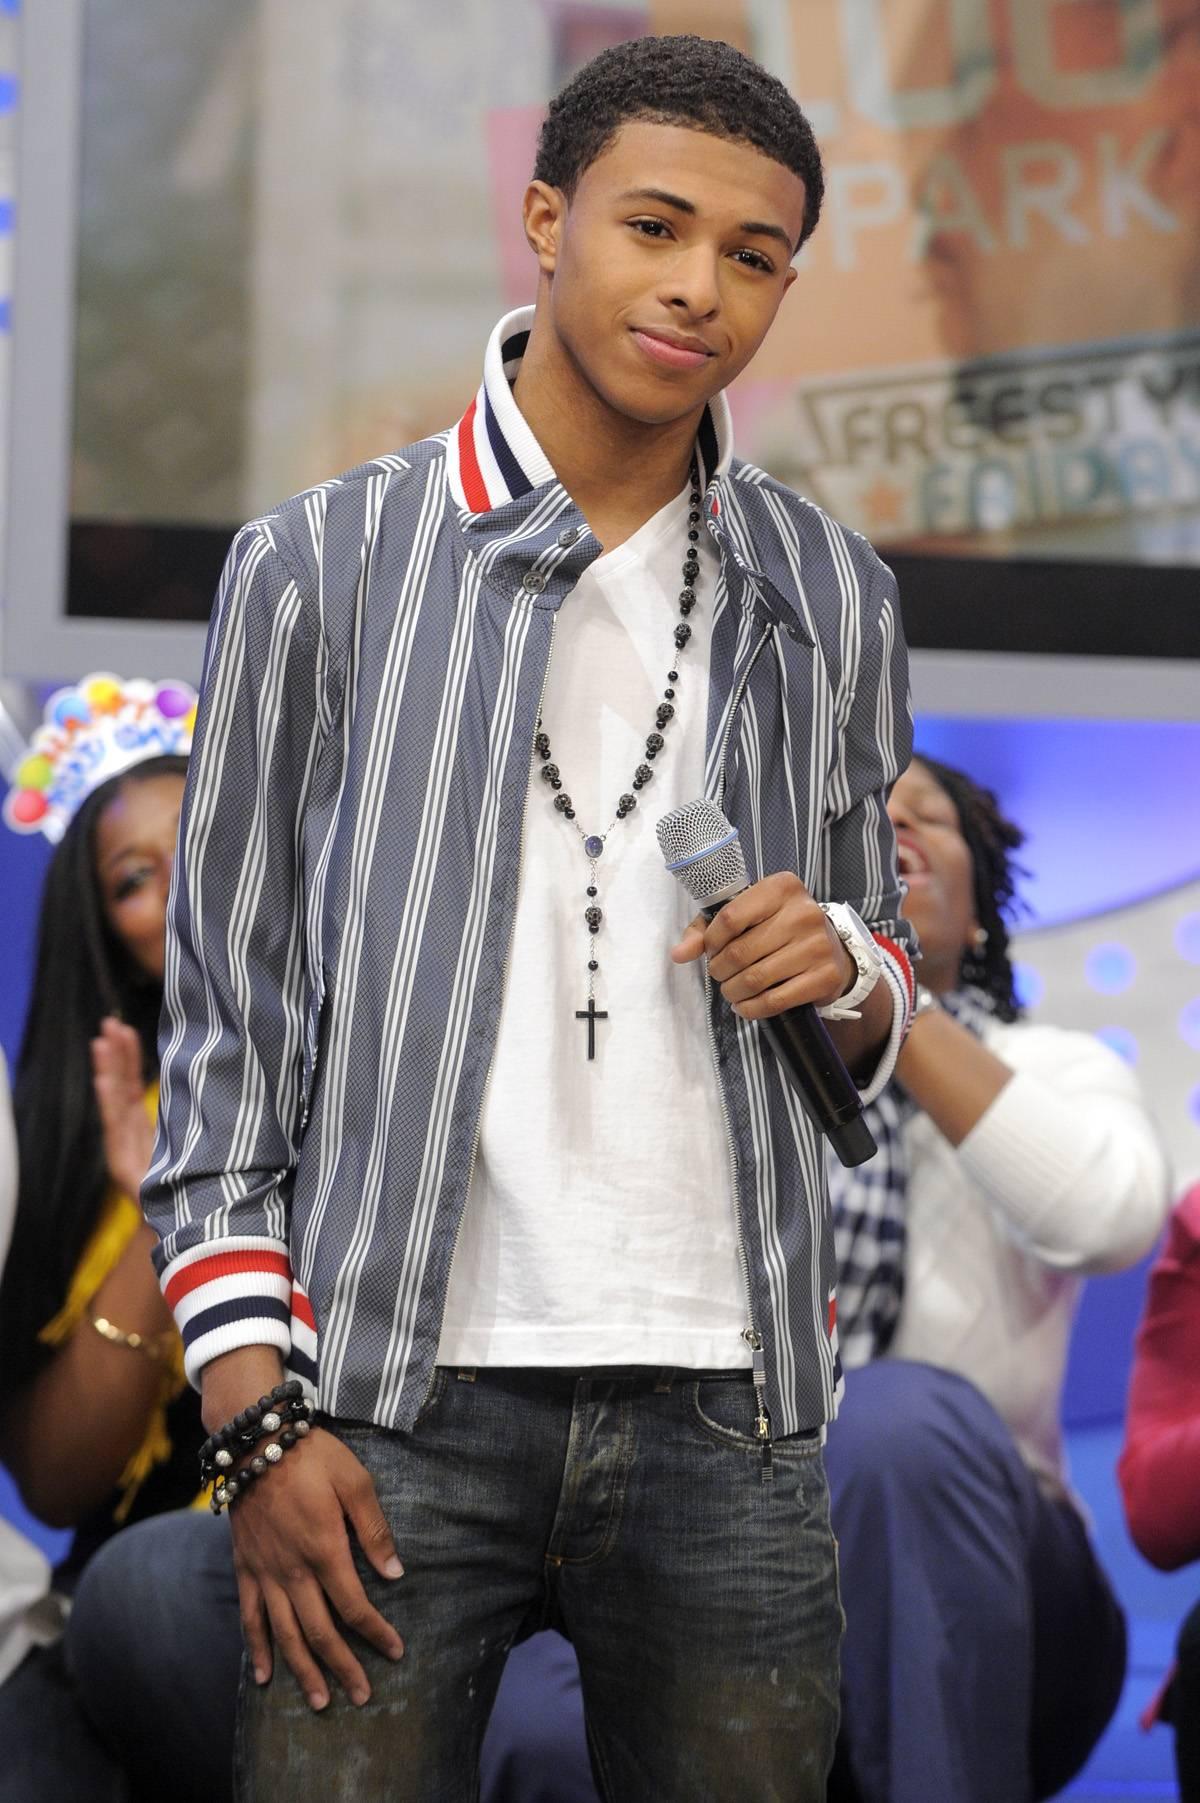 Laid Back - Diggy Simmons at 106 & Park, January 20, 2012. (Photo: John Ricard / BET)